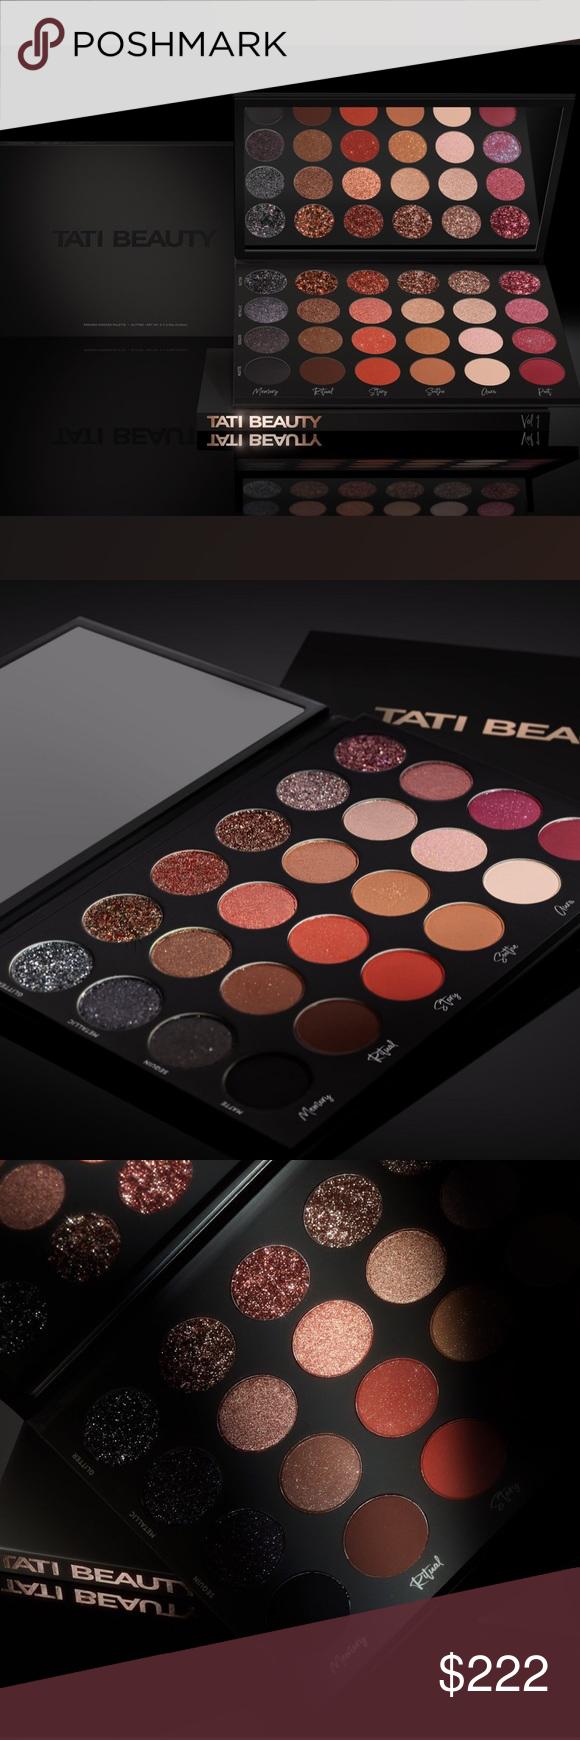 Tati Beauty Textured Neutrals Vol I NWT Colorful